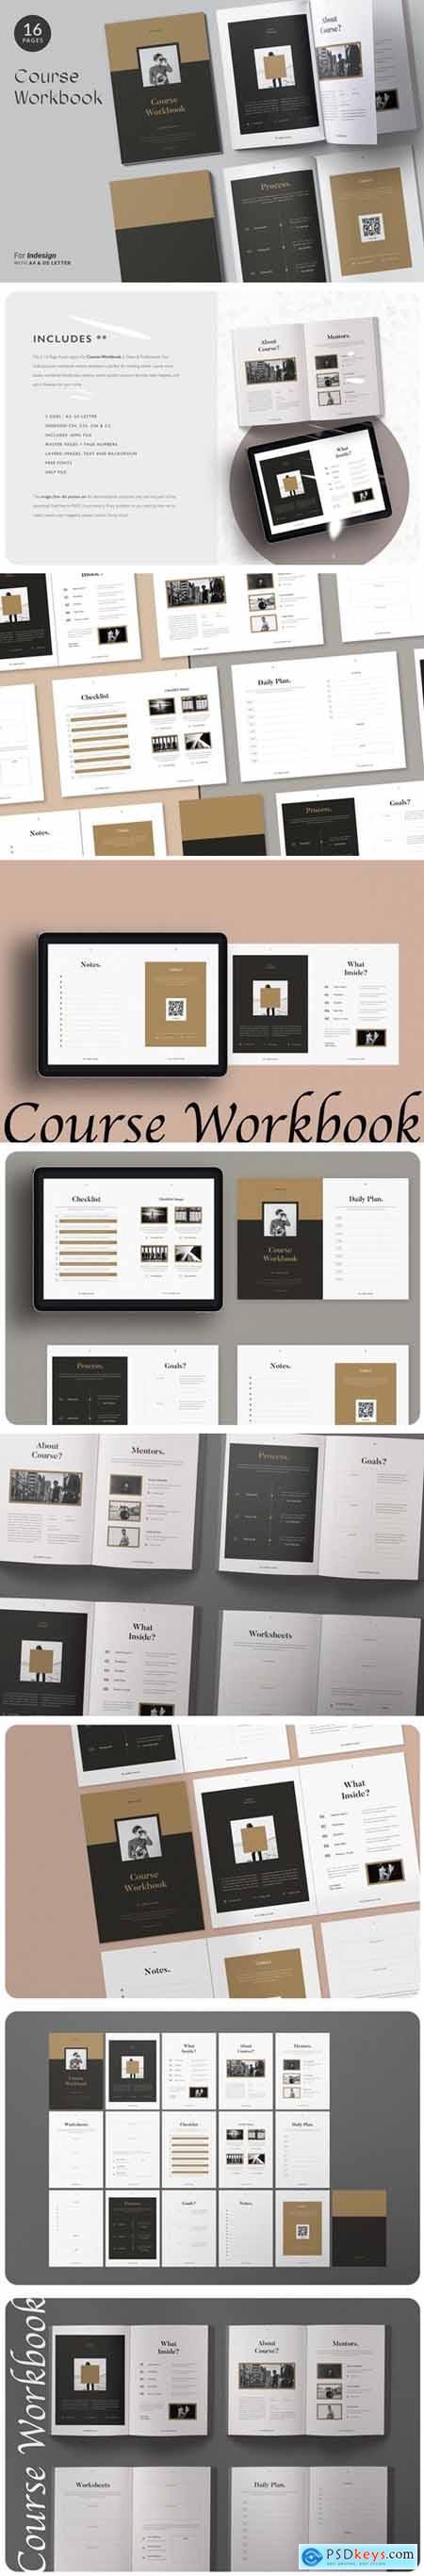 The Course Workbook